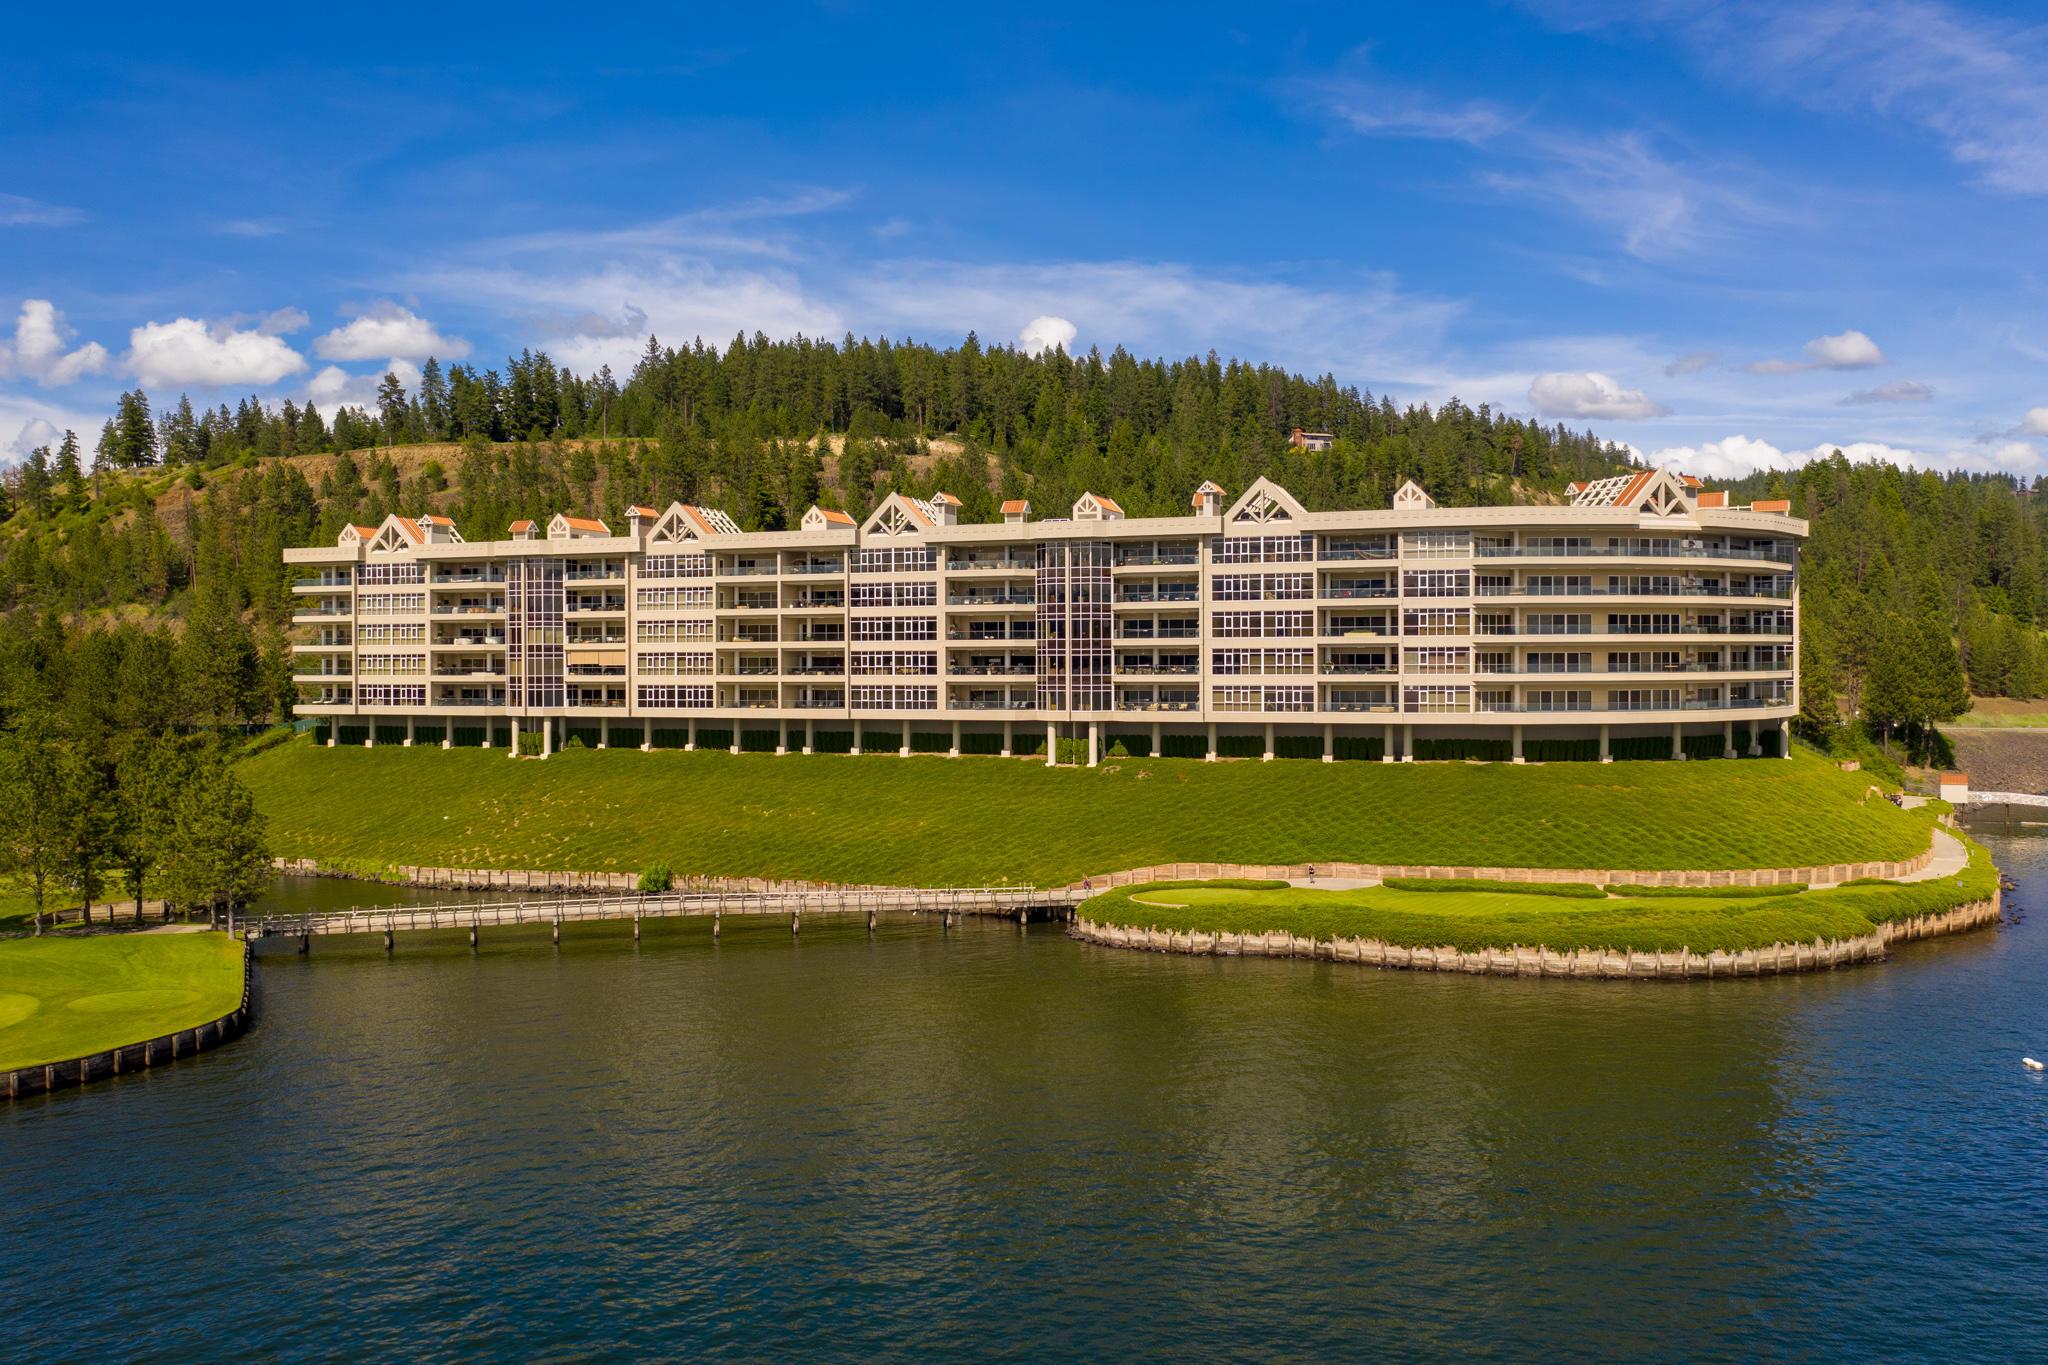 photo of 2021 S ISLAND GREEN DR Coeur d'Alene Idaho 83814